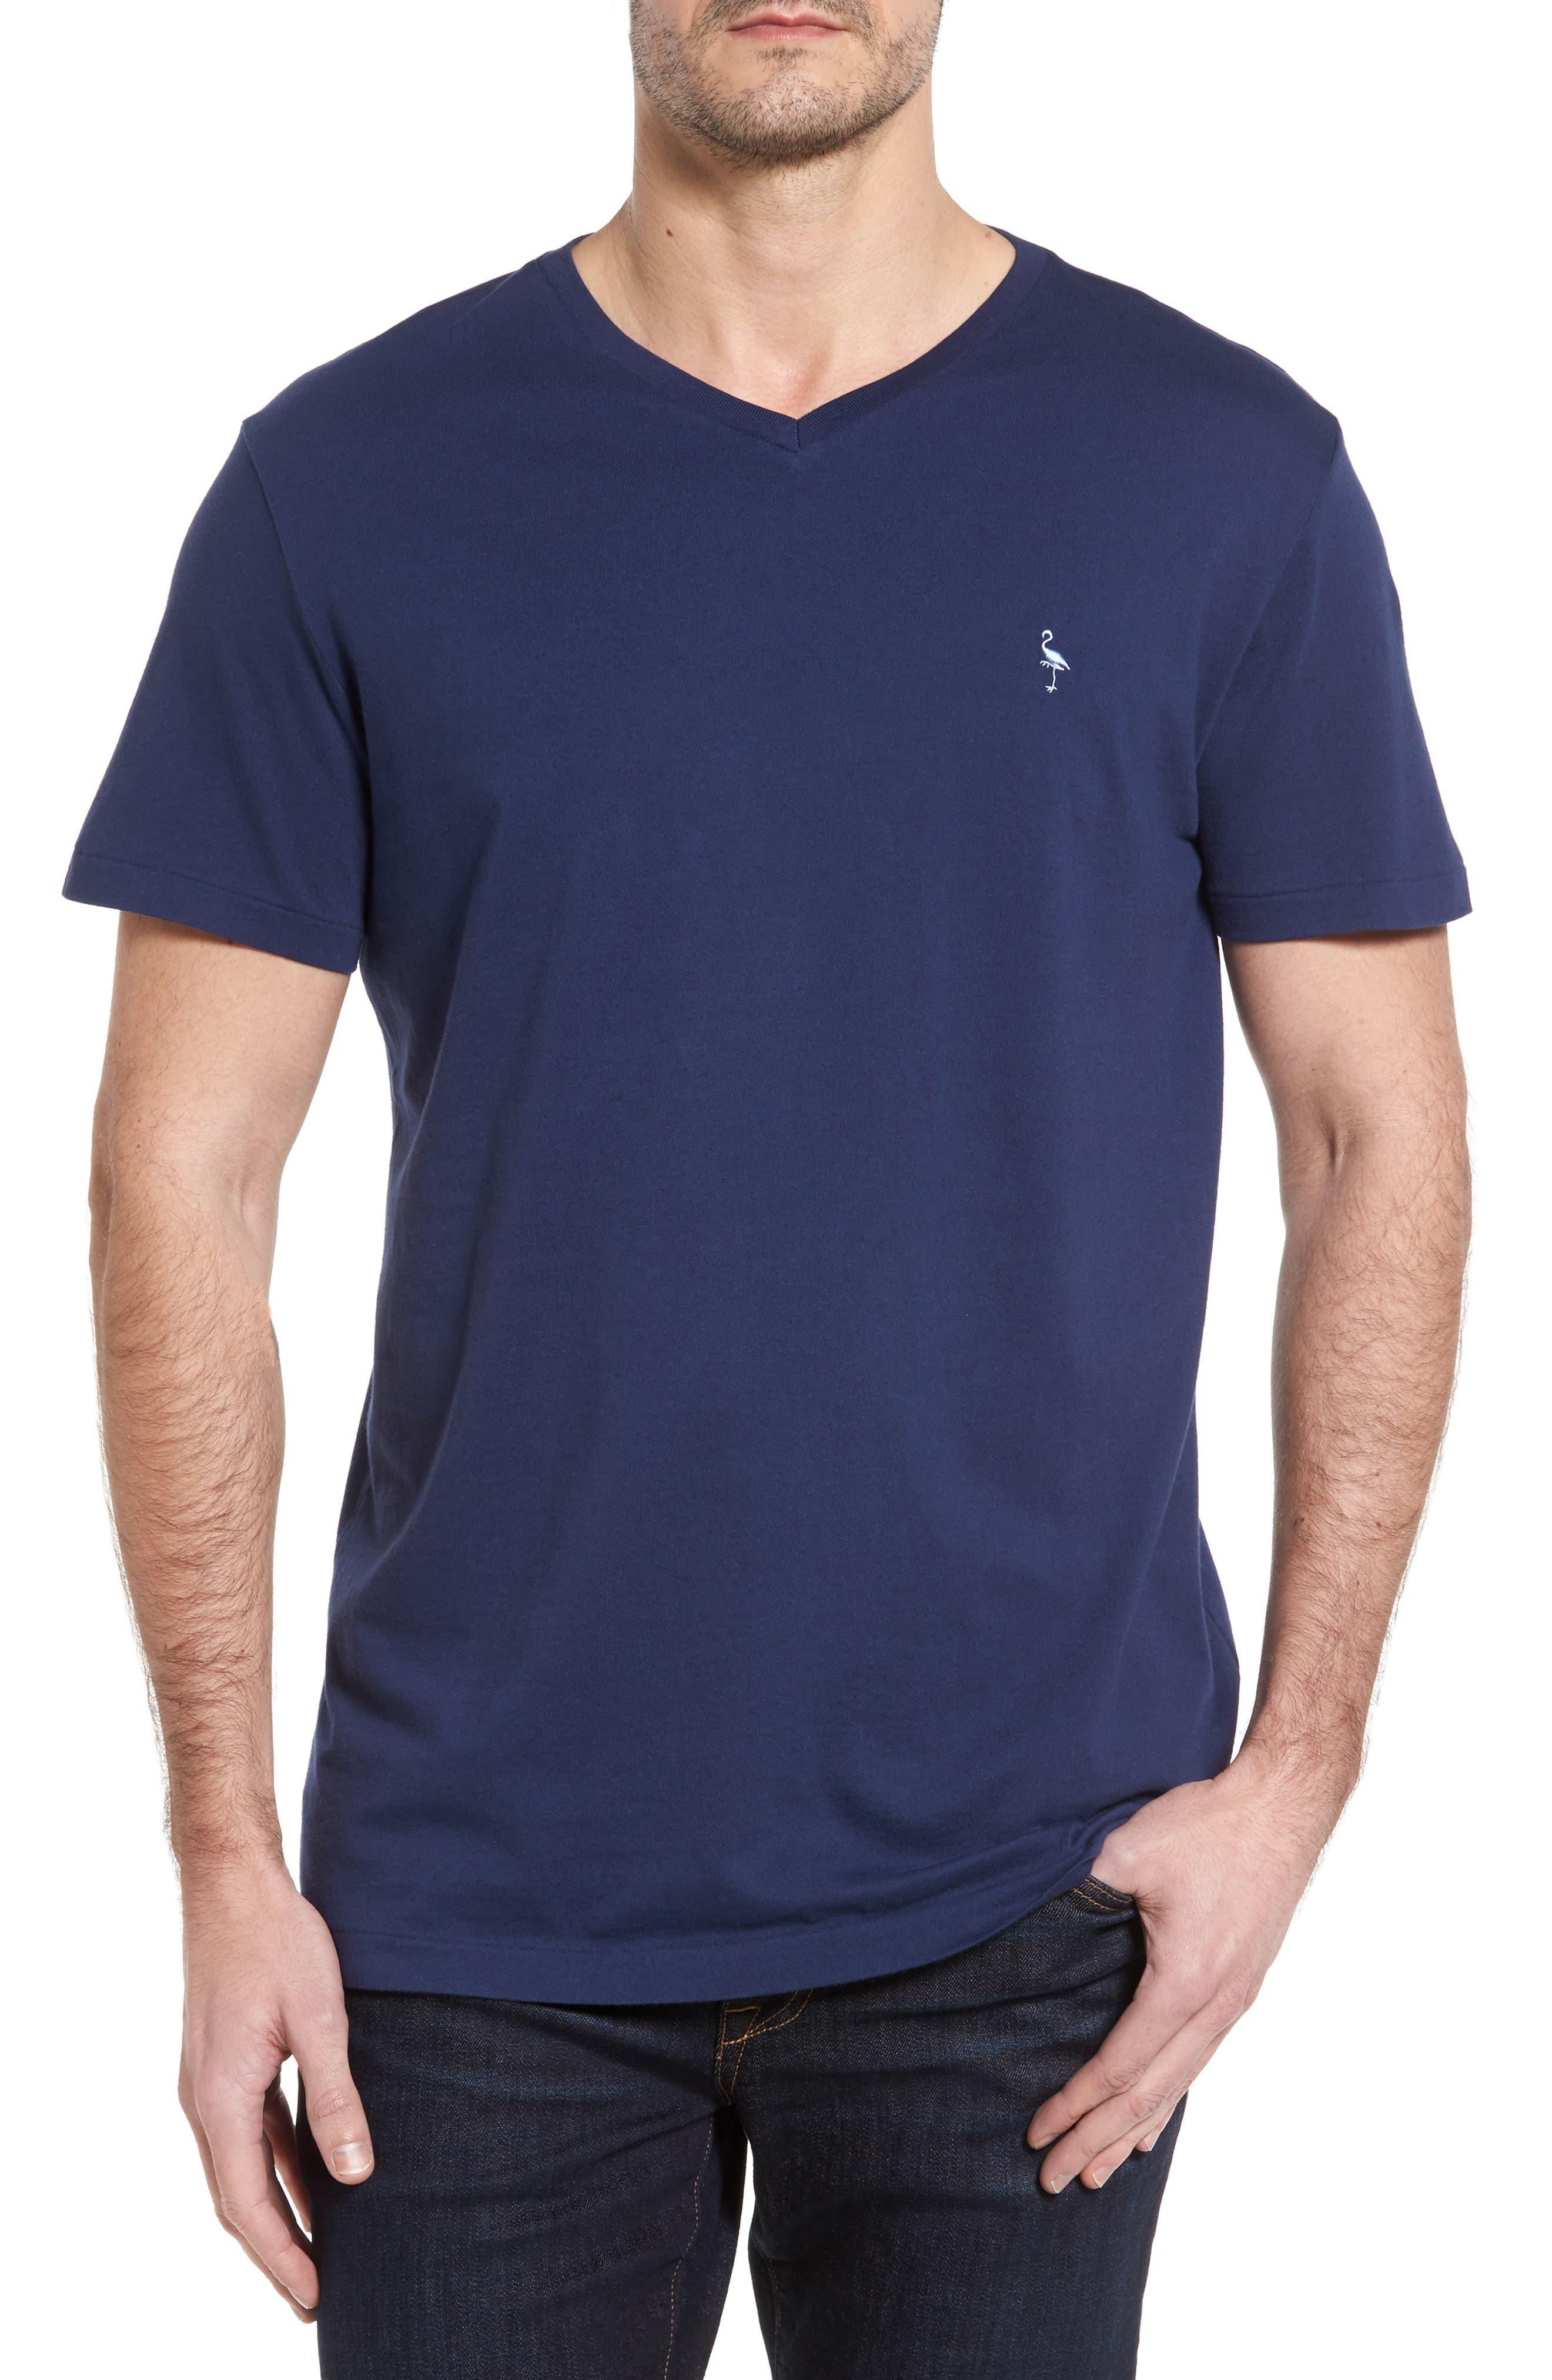 TailorByrd V-Neck T-Shirt